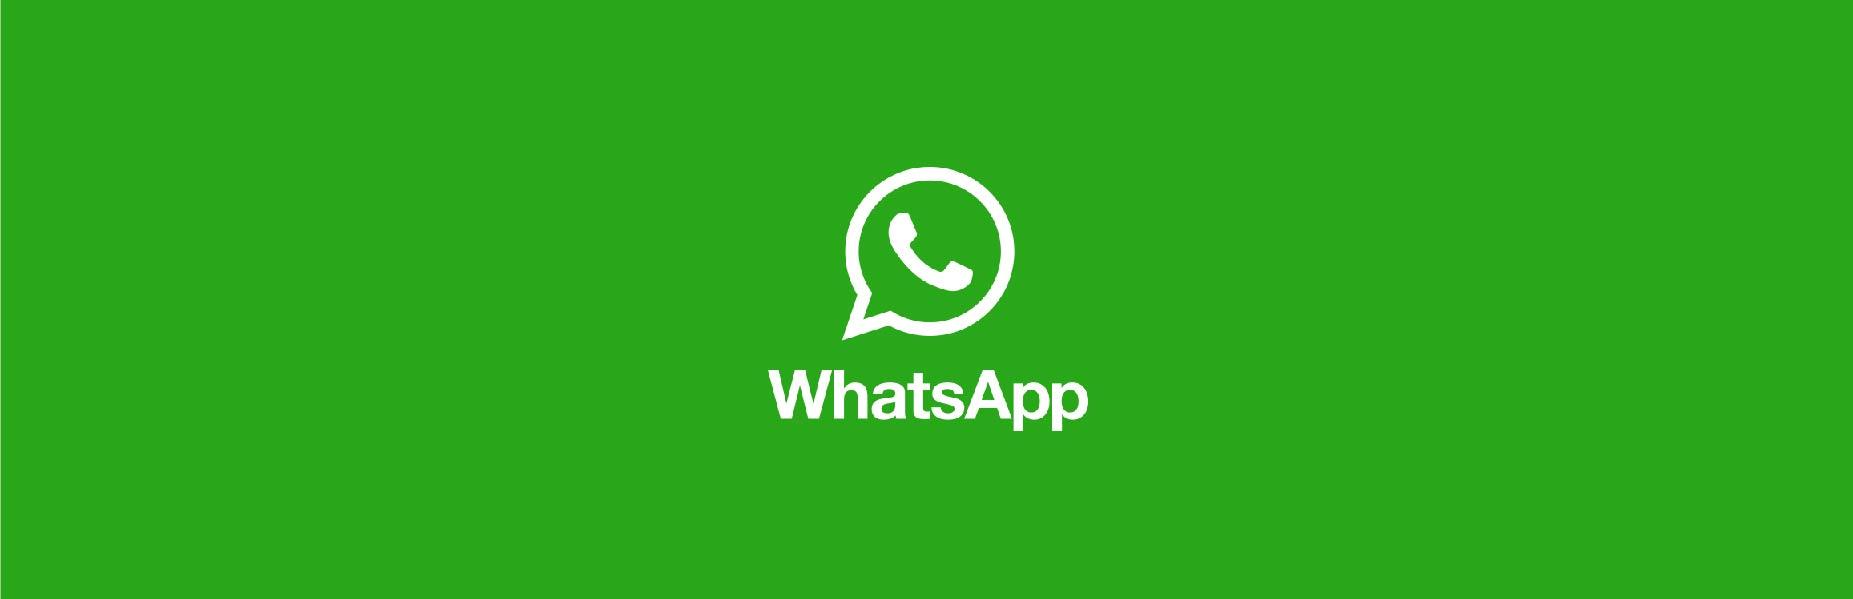 whatsappparamarketing